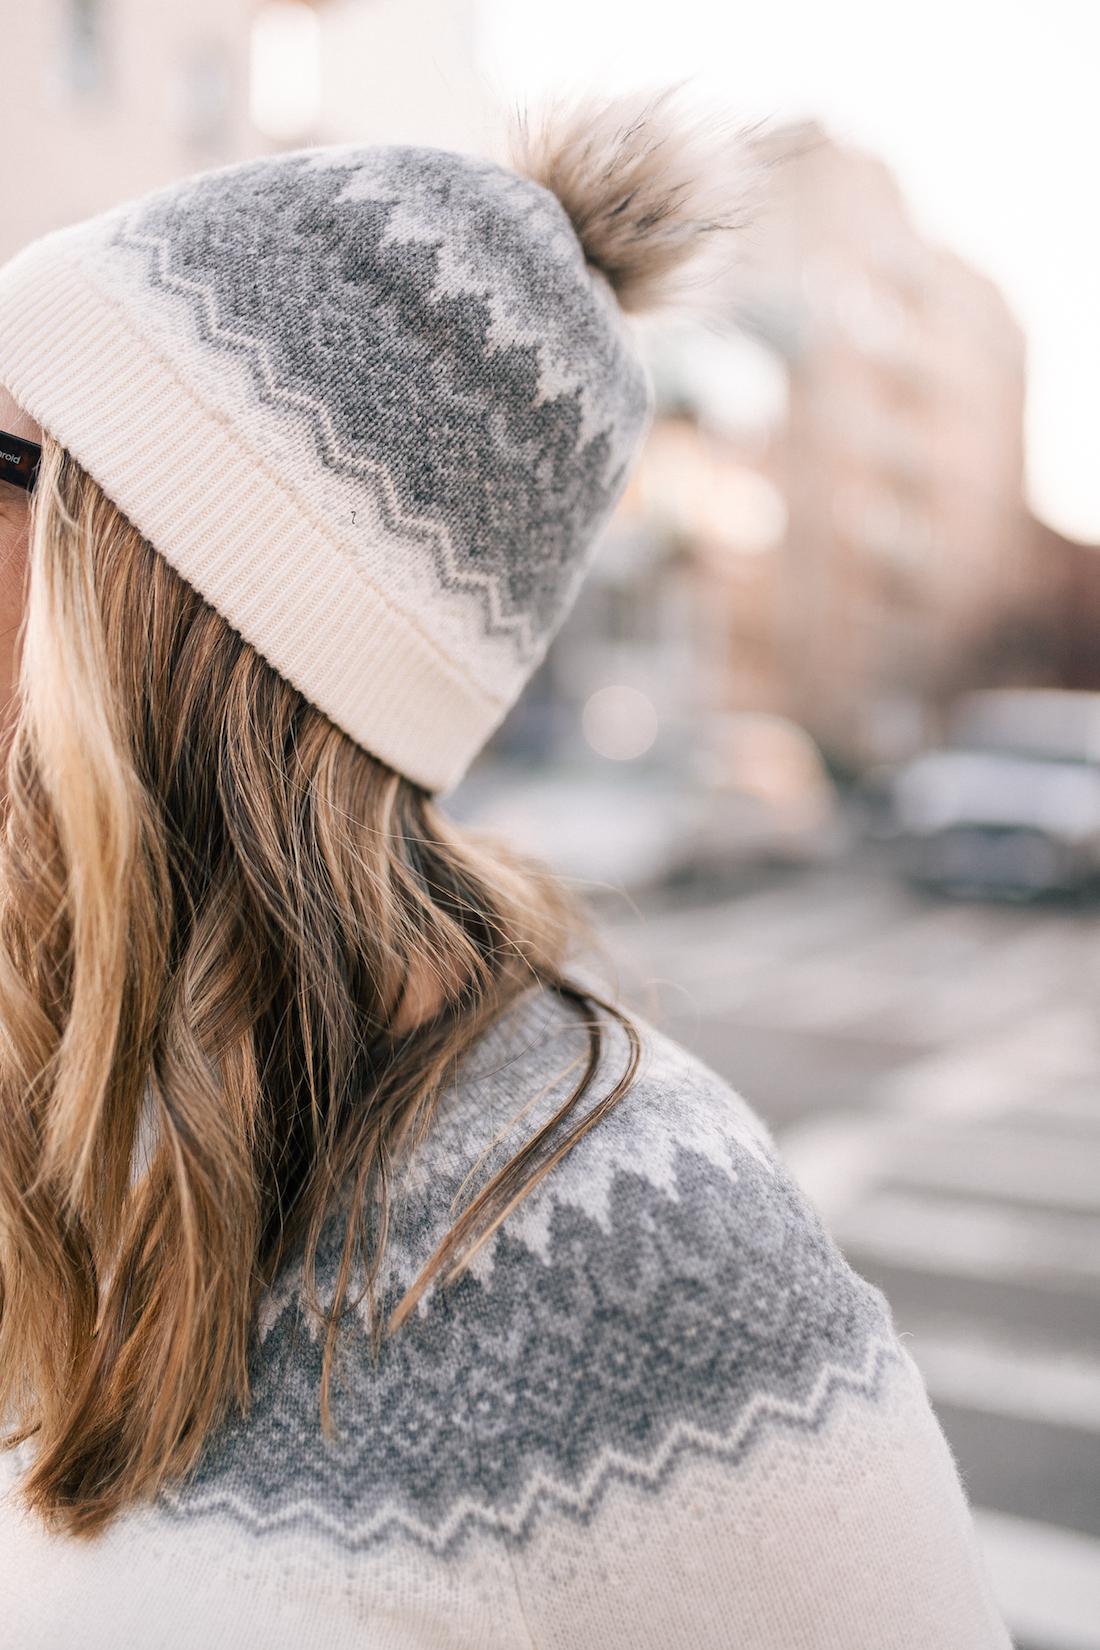 Vineyard Vines Sweater + Hat (c/o)